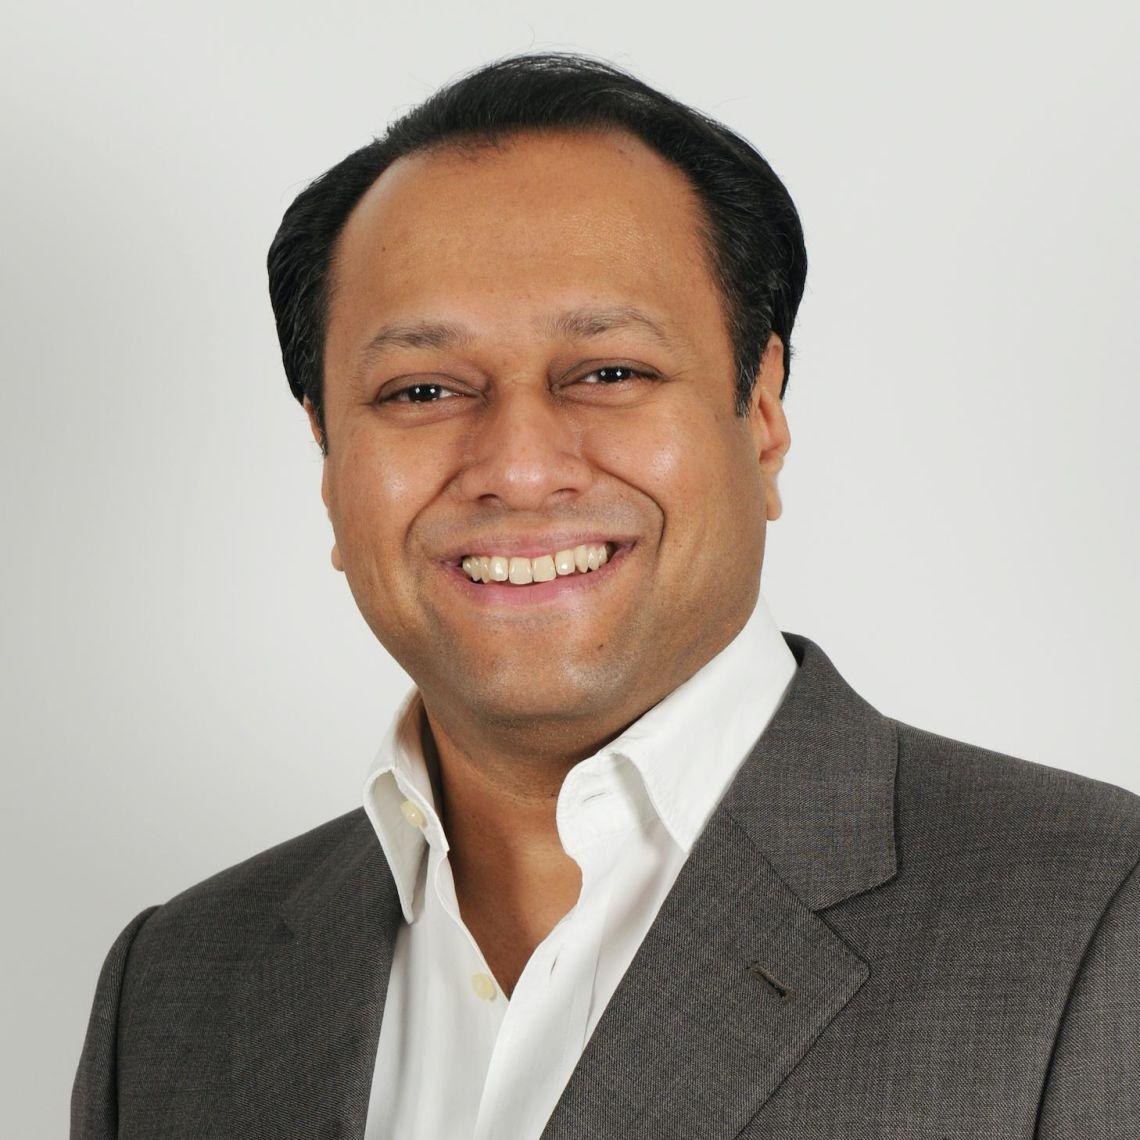 Abhilash Jain